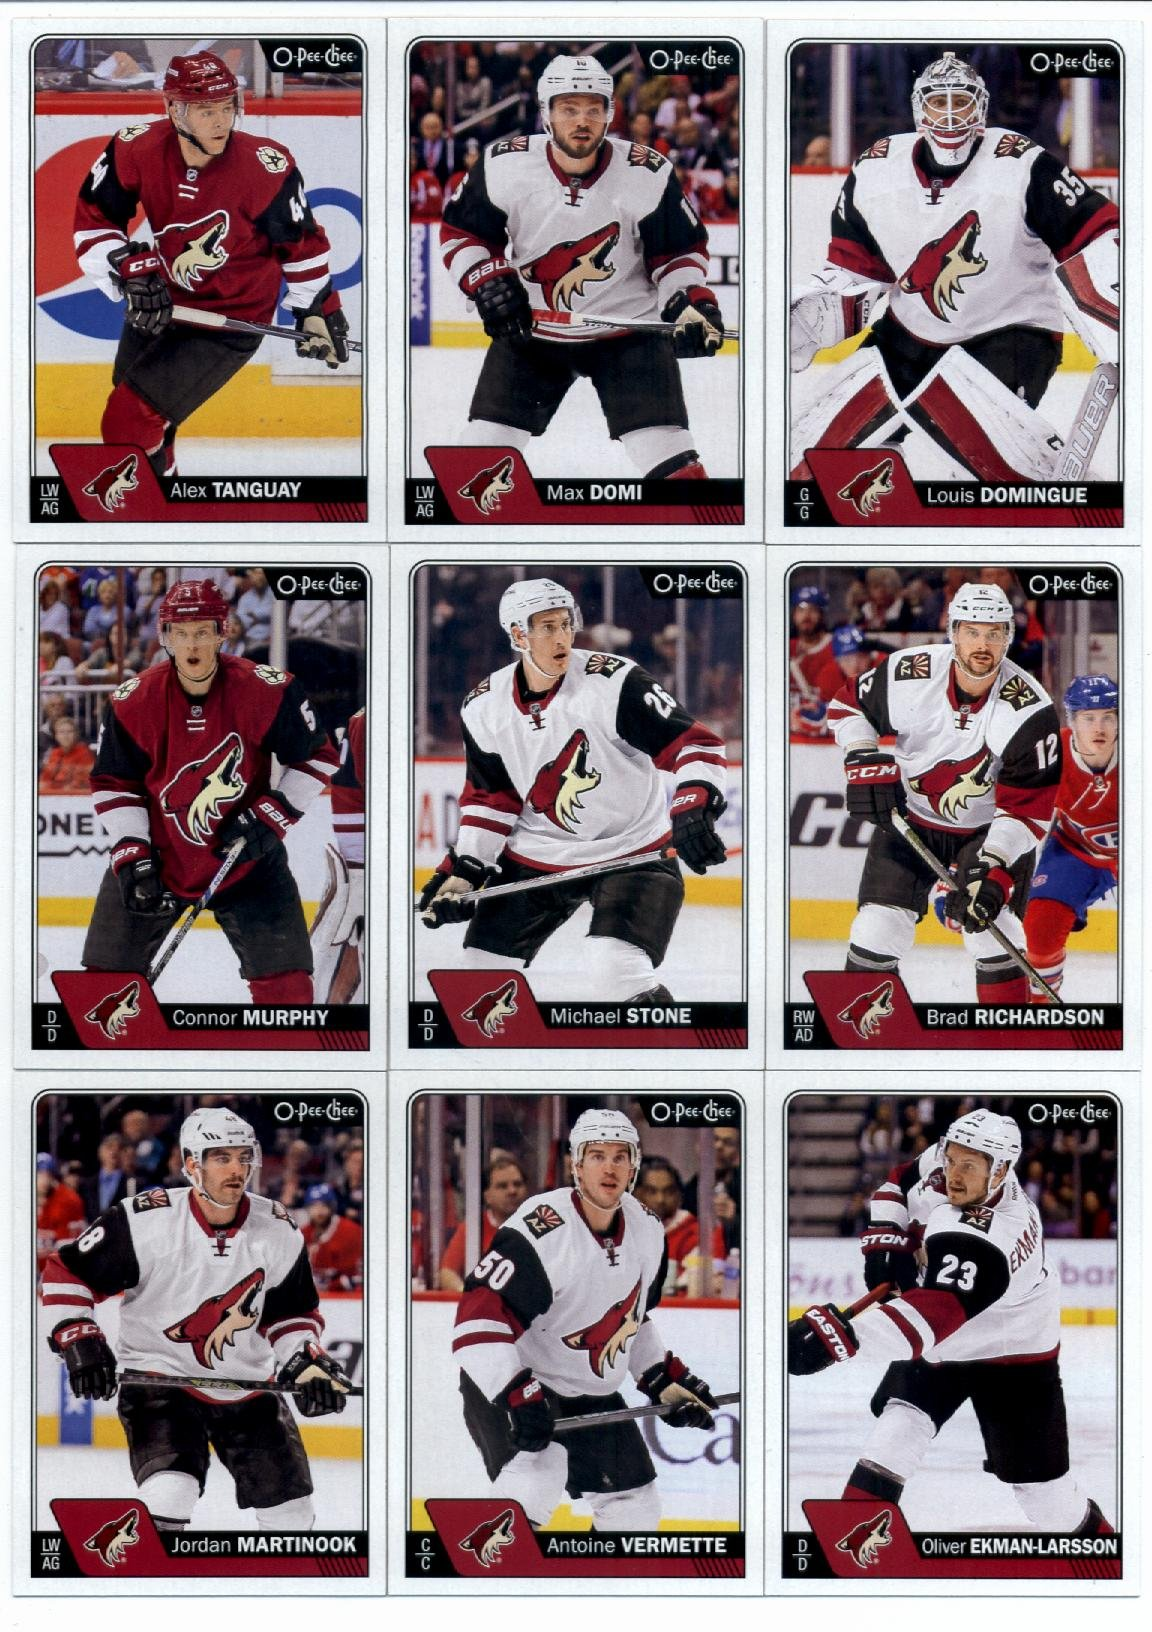 2016-17 O-Pee-Chee Hockey Arizona Coyotes Team Set of 16 Cards in Protective Snap Case: Louis Domingue(#24), Max Domi(#31), Alex Tanguay(#81), Brad Richardson(#104), Michael Stone(#131), Connor Murphy(#162), Oliver Ekman-Larsson(#190), Antoine Vermette(#215), Jordan Martinook(#241), Martin